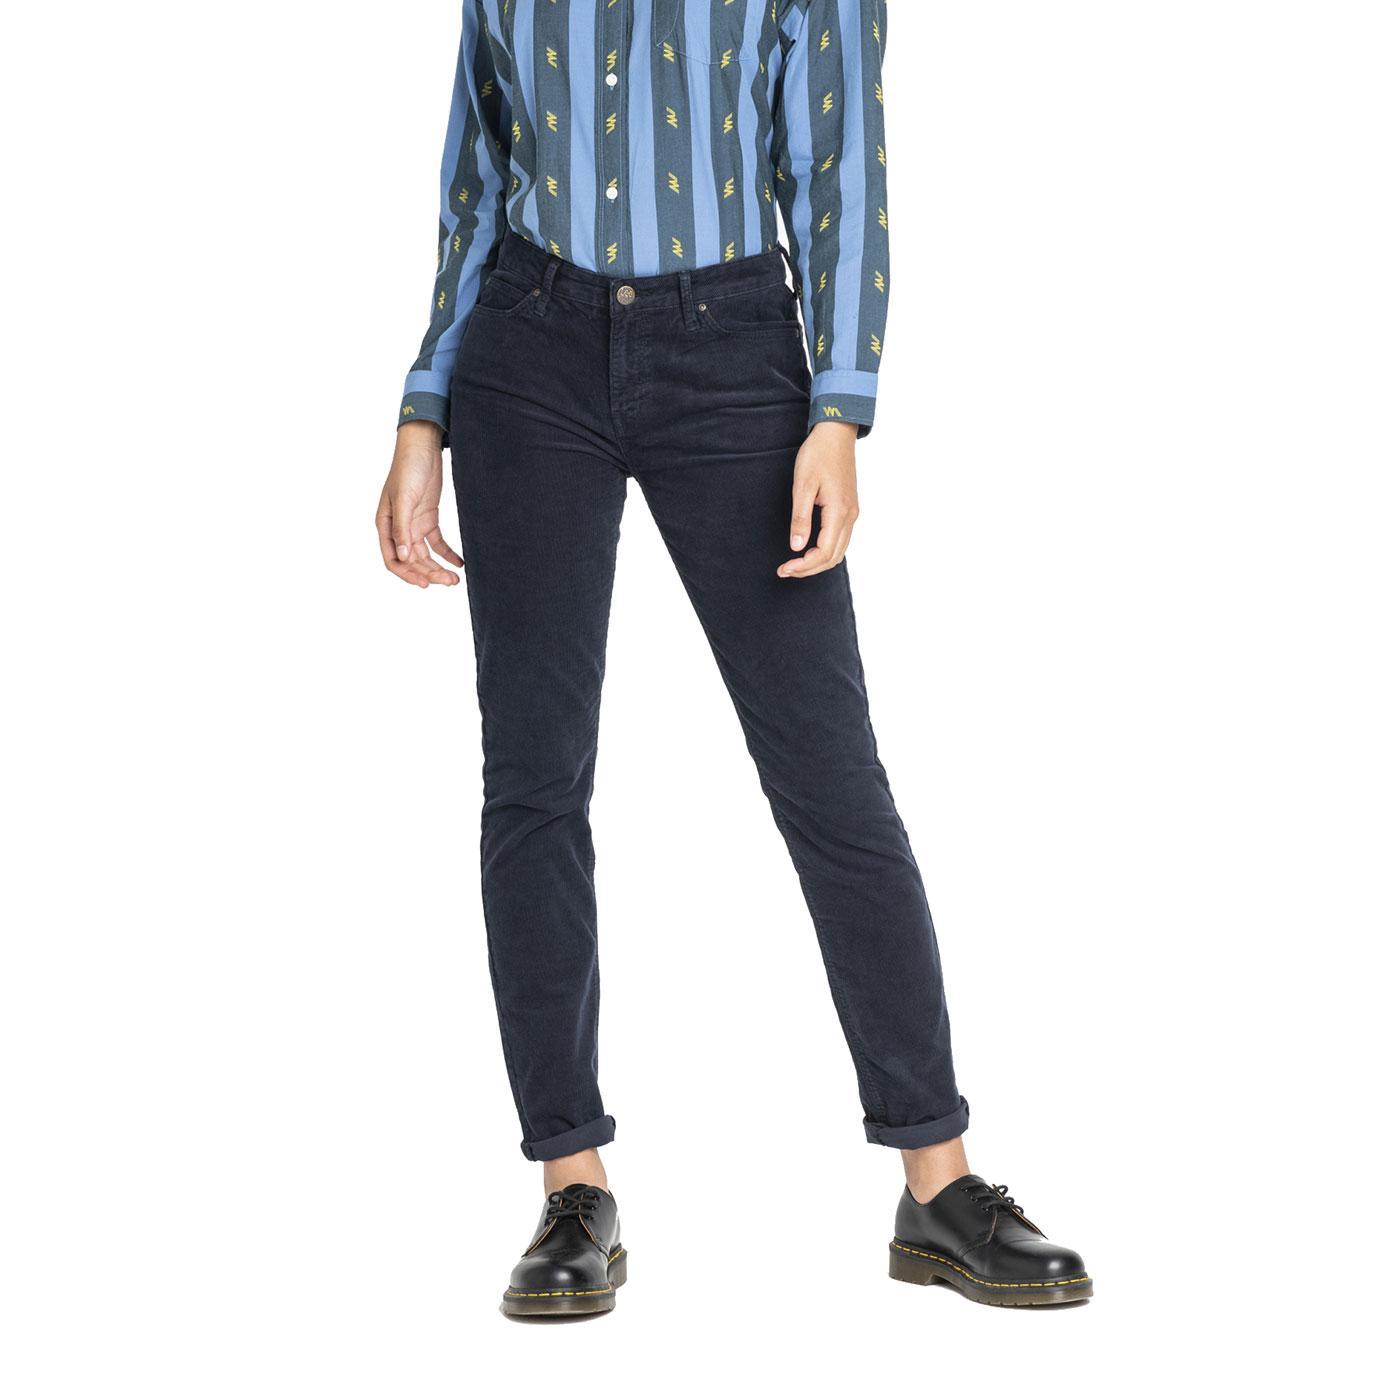 Elly LEE JEANS Womens Slim Cord Jeans MARINE